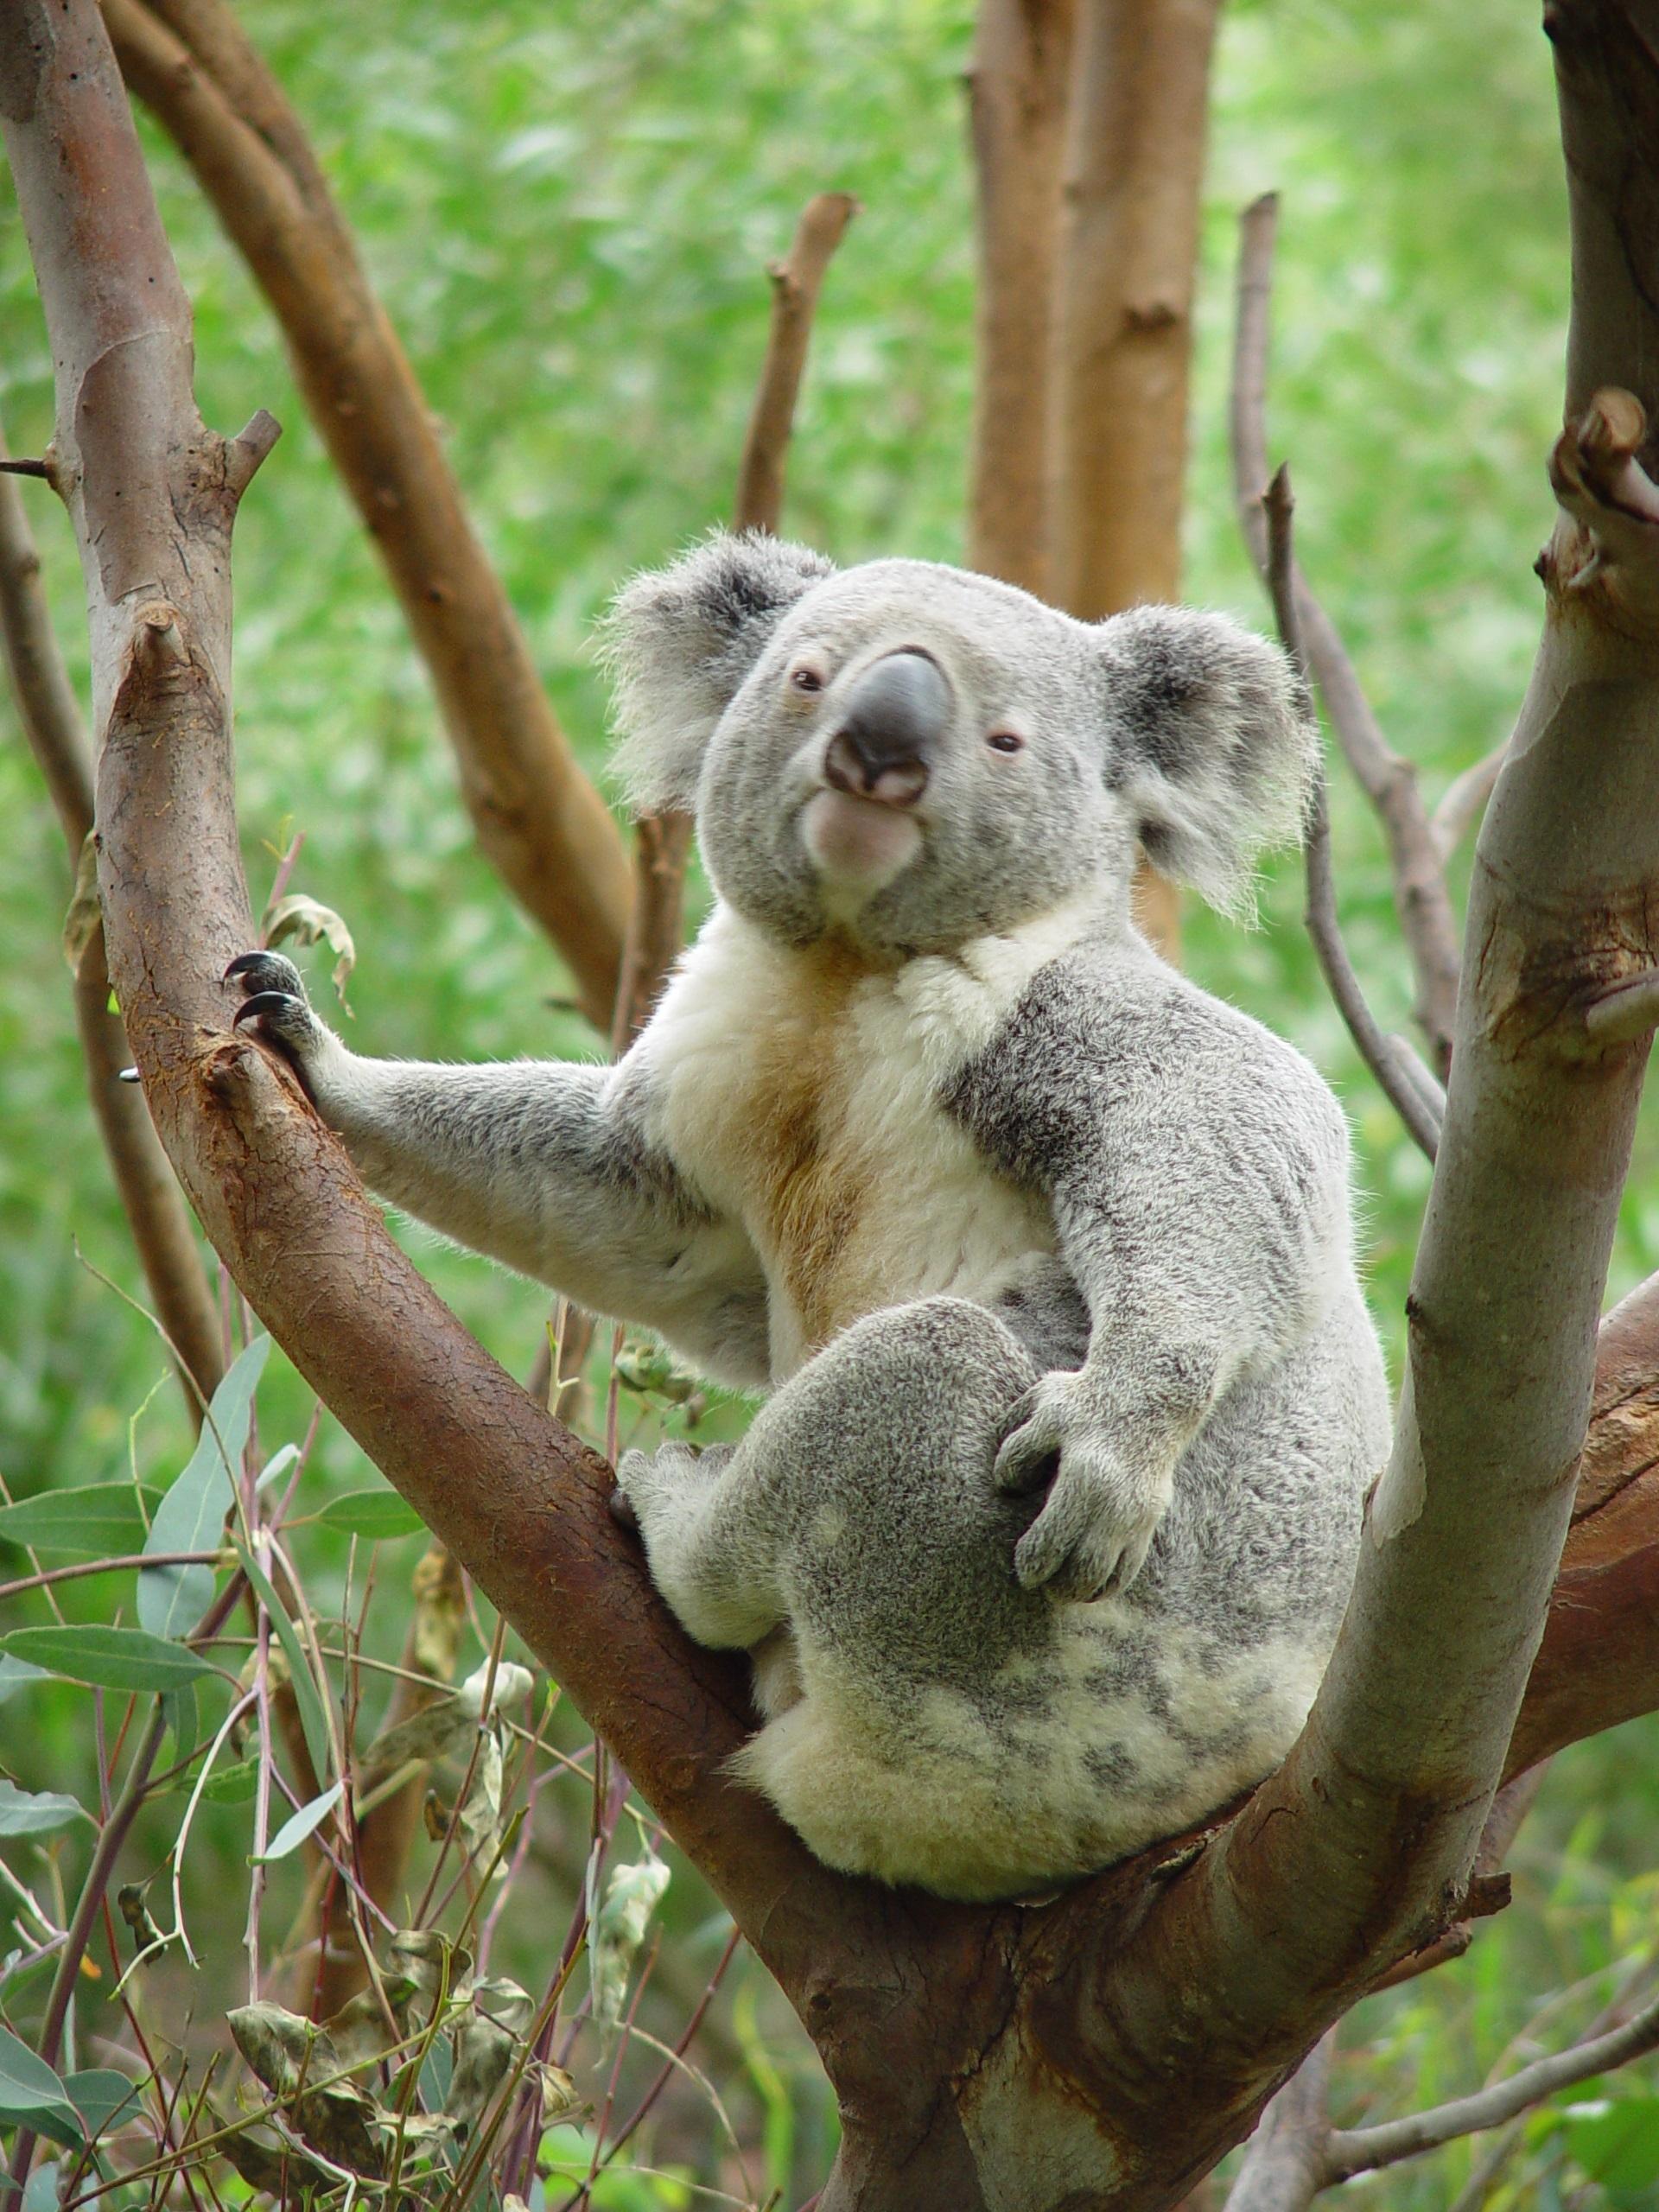 Koala on the tree photo